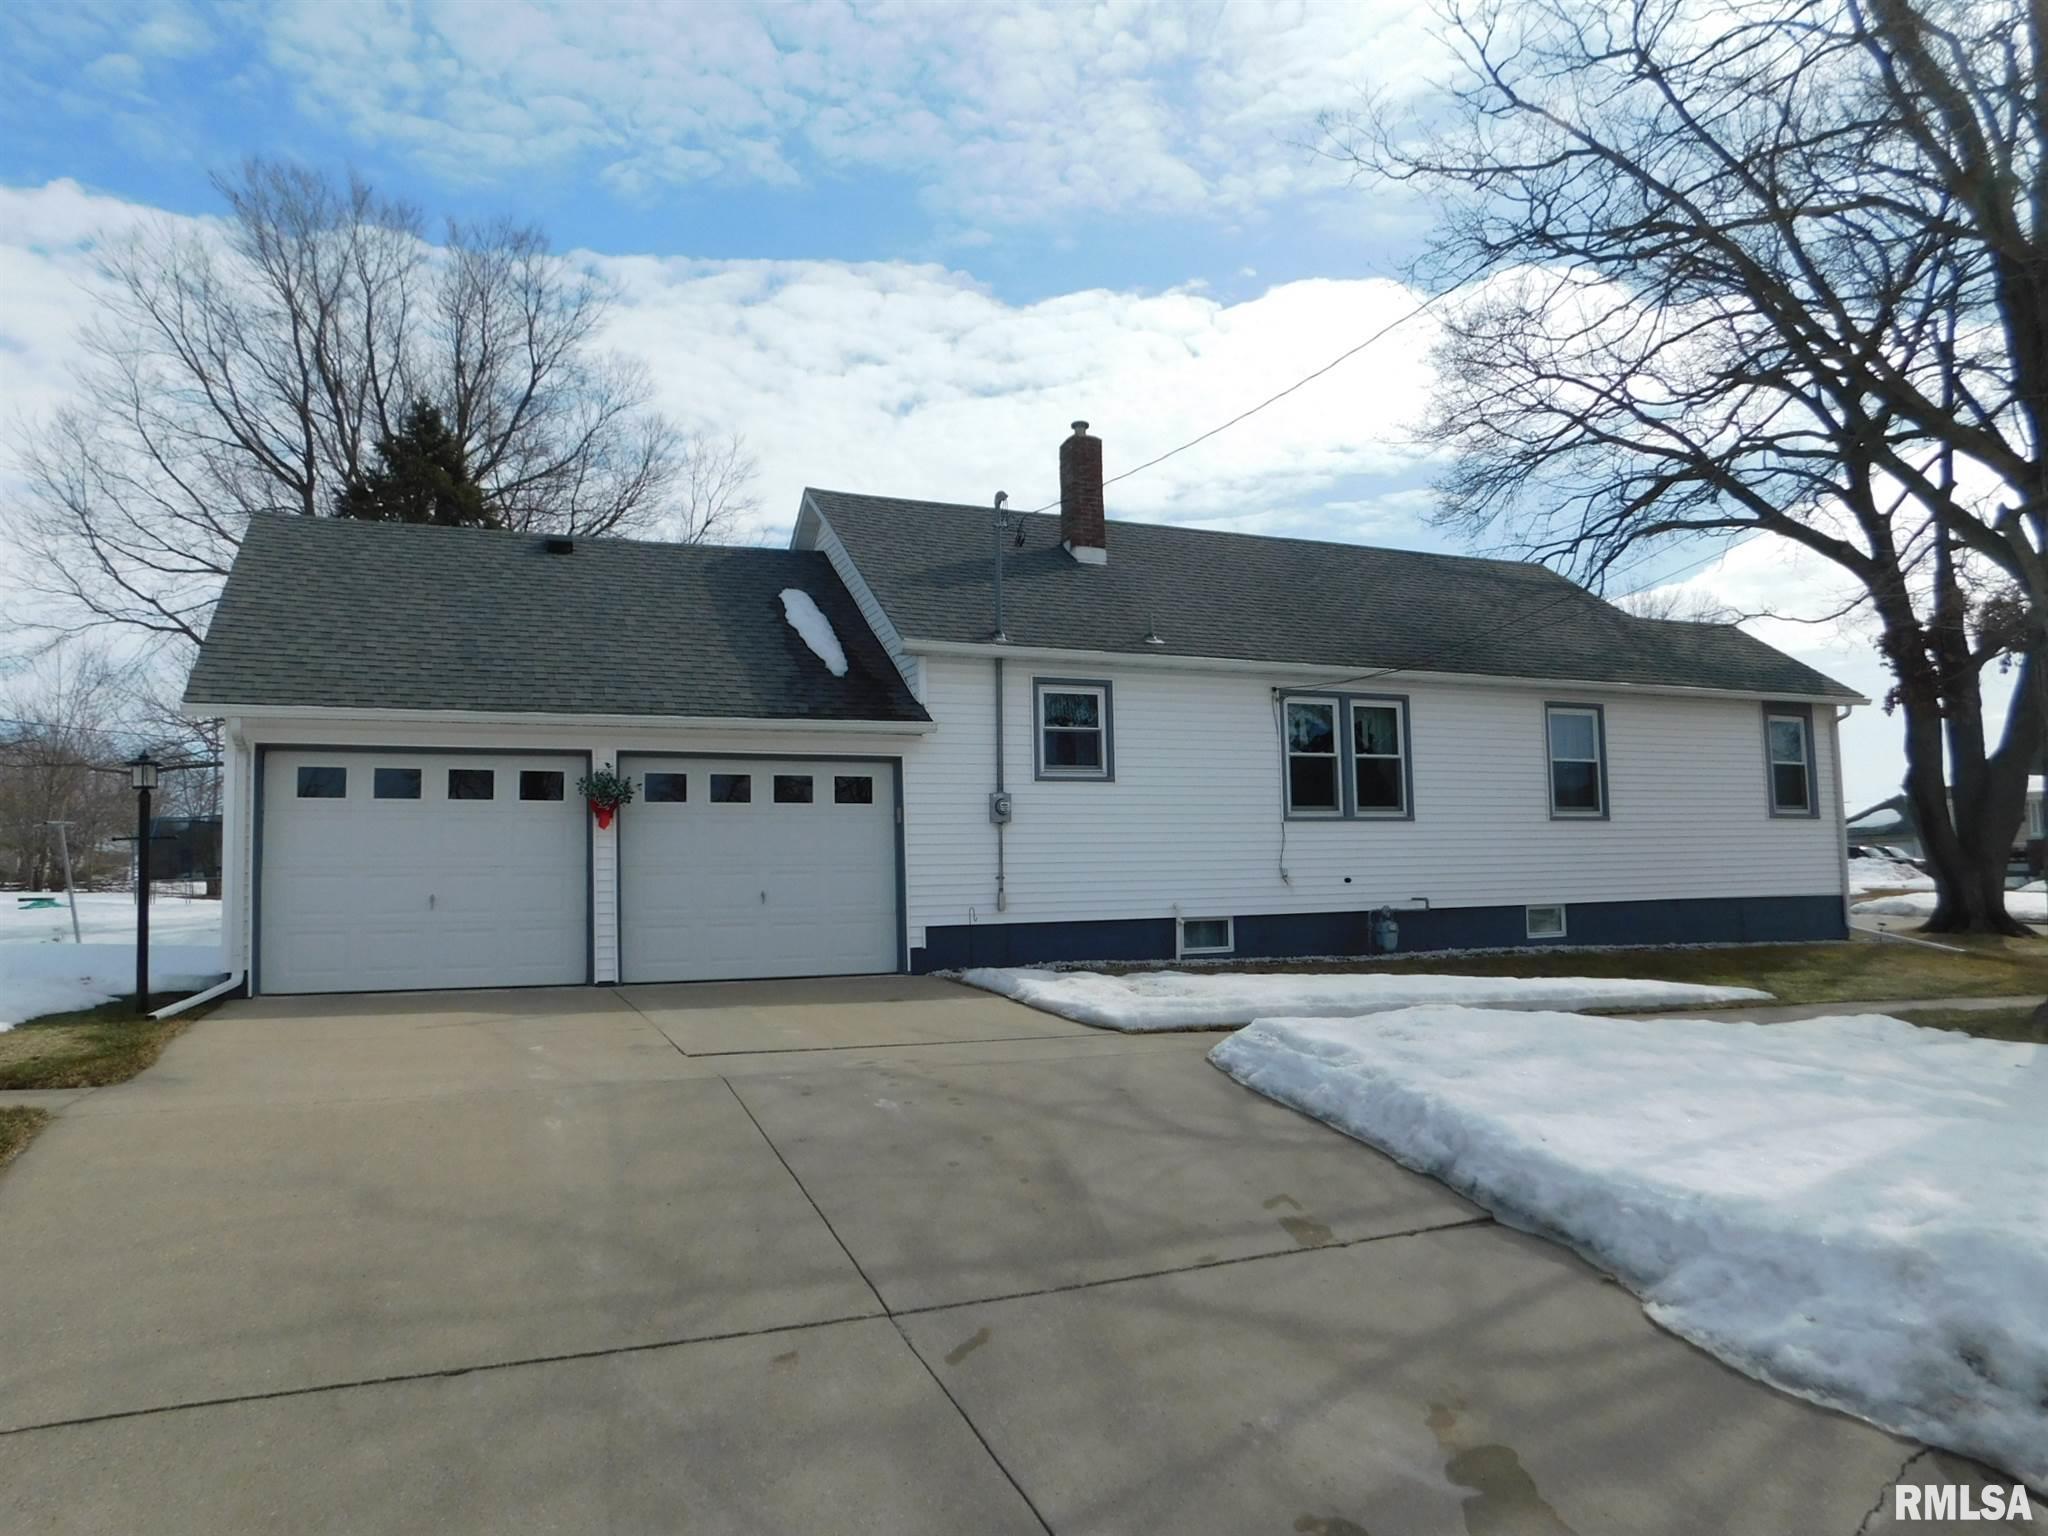 418 W 2ND Property Photo - Tipton, IA real estate listing